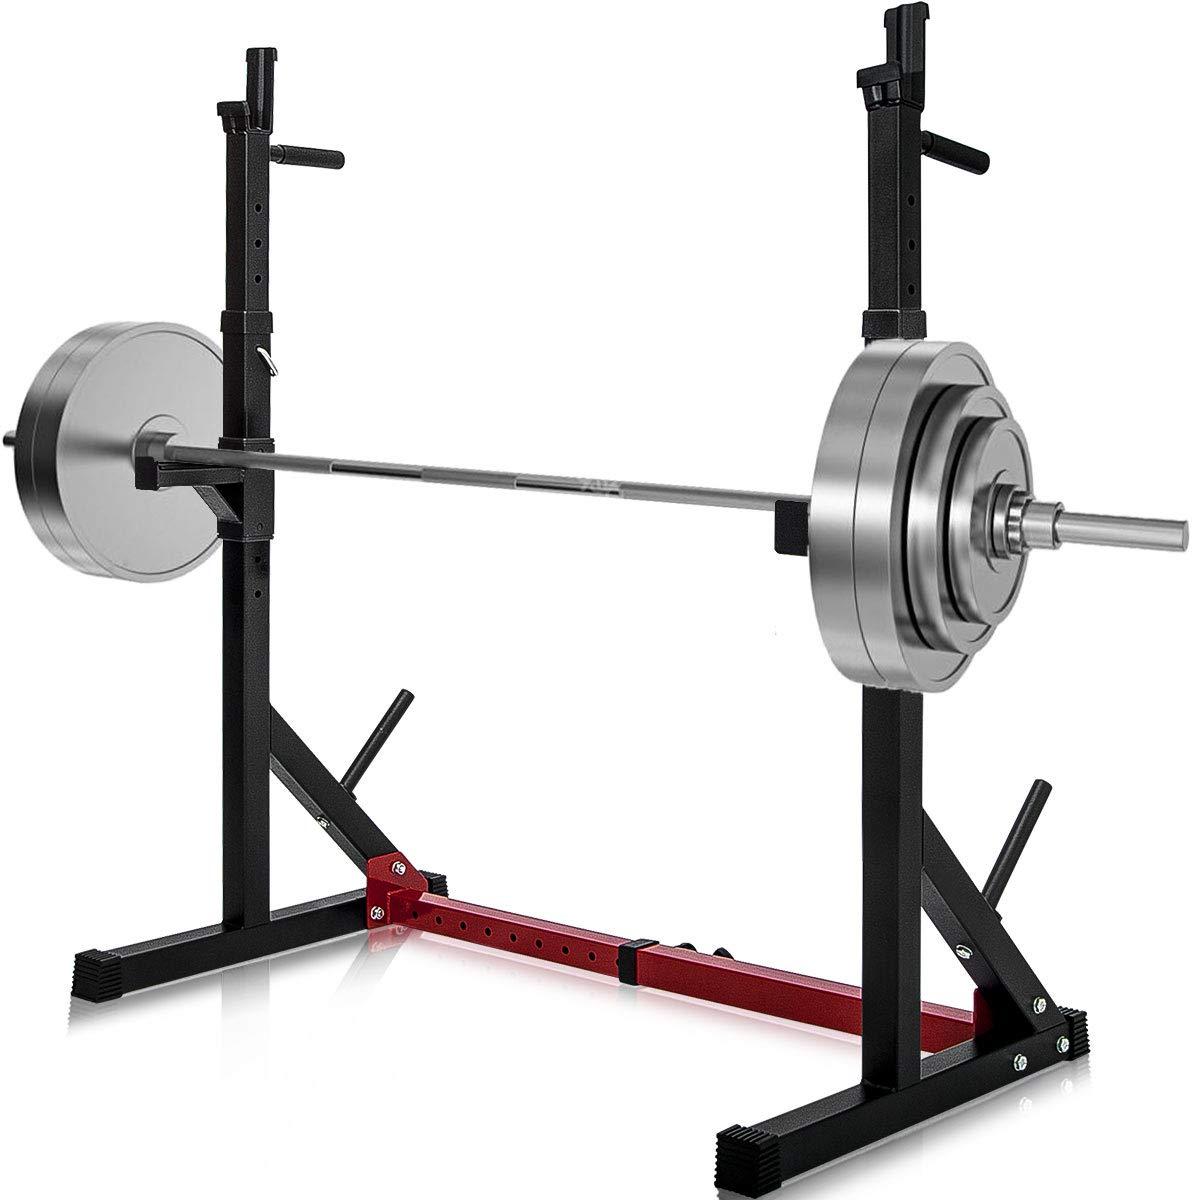 Amazon.com : merax barbell rack 550lbs max load adjustable squat